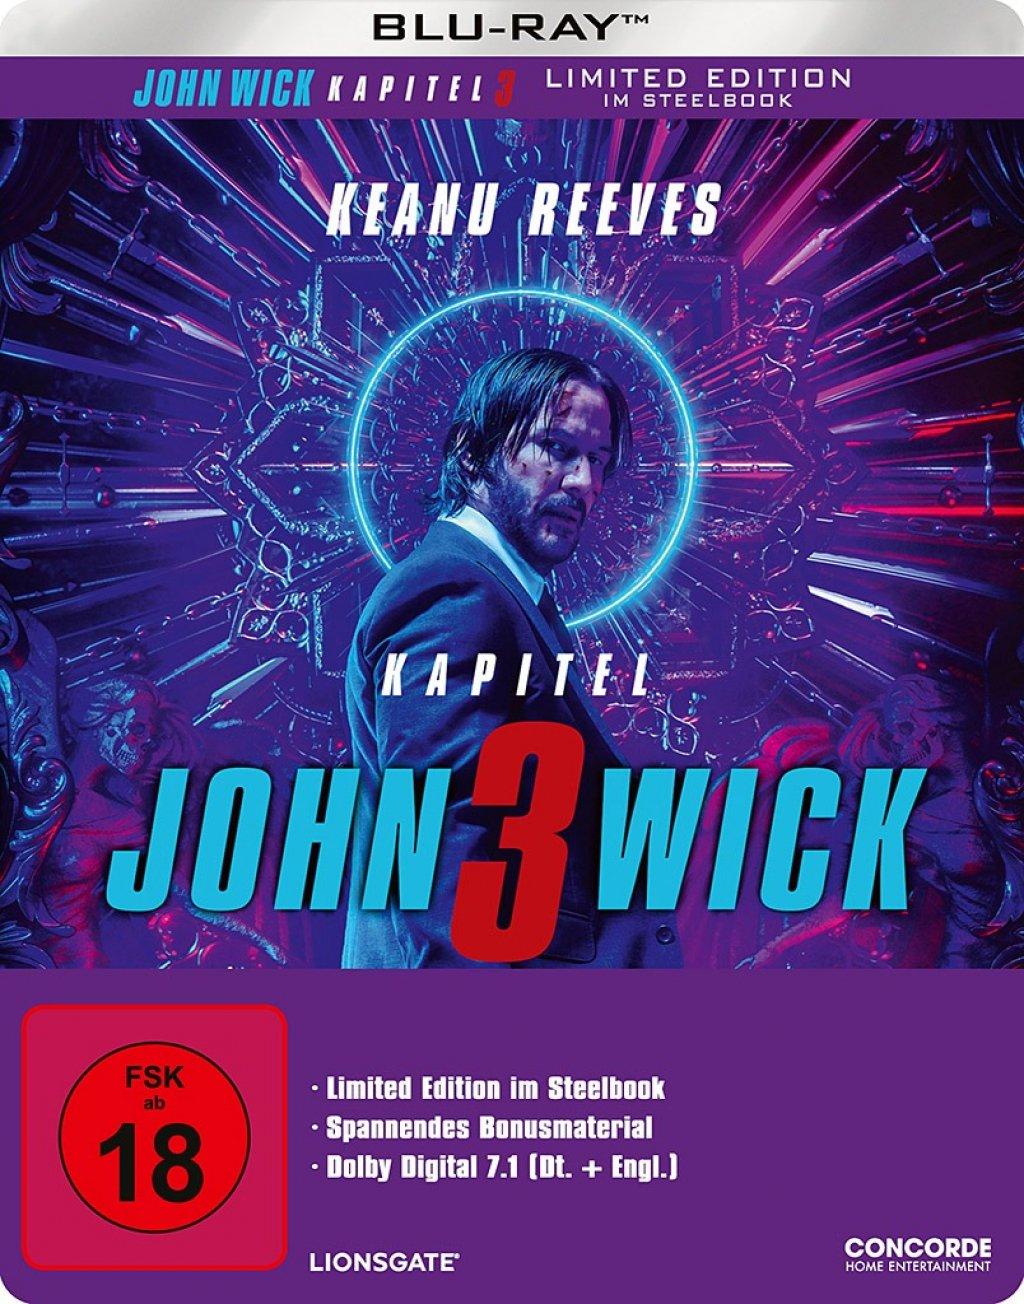 John Wick: Kapitel 3 Limited Steelbook (Blu-ray) für 11,99€ & 4K UHD + Blu-ray für 19,99€ (Amazon & Saturn & Media Markt)